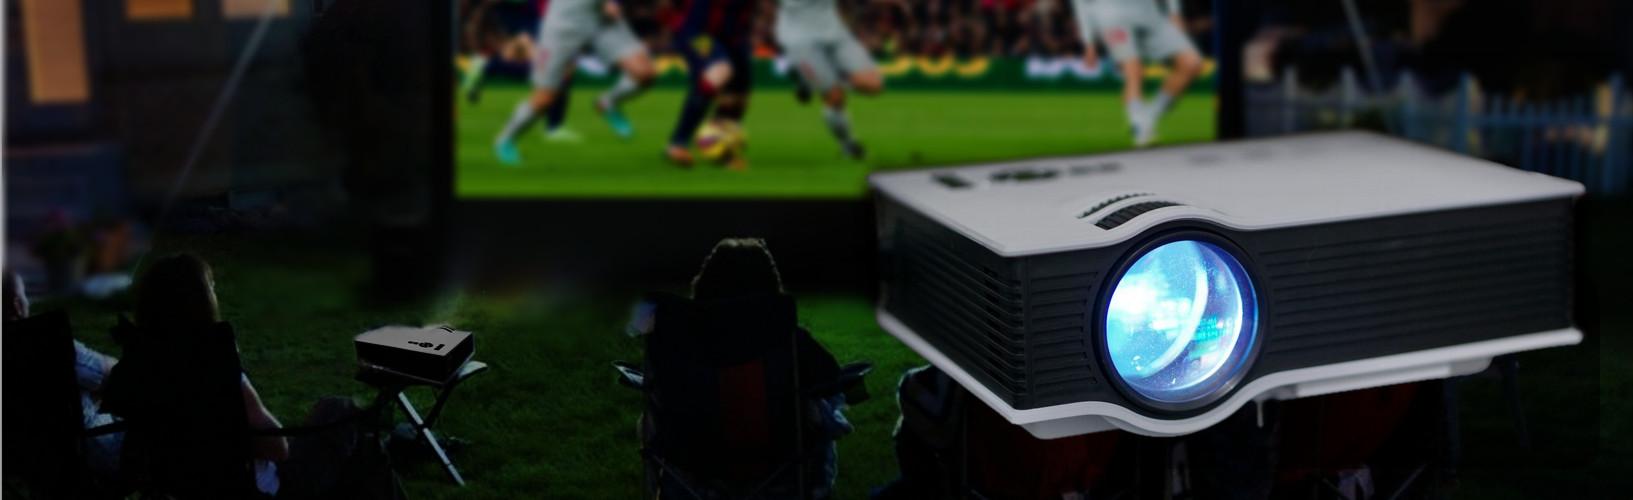 Видеопроектор Unic UC40